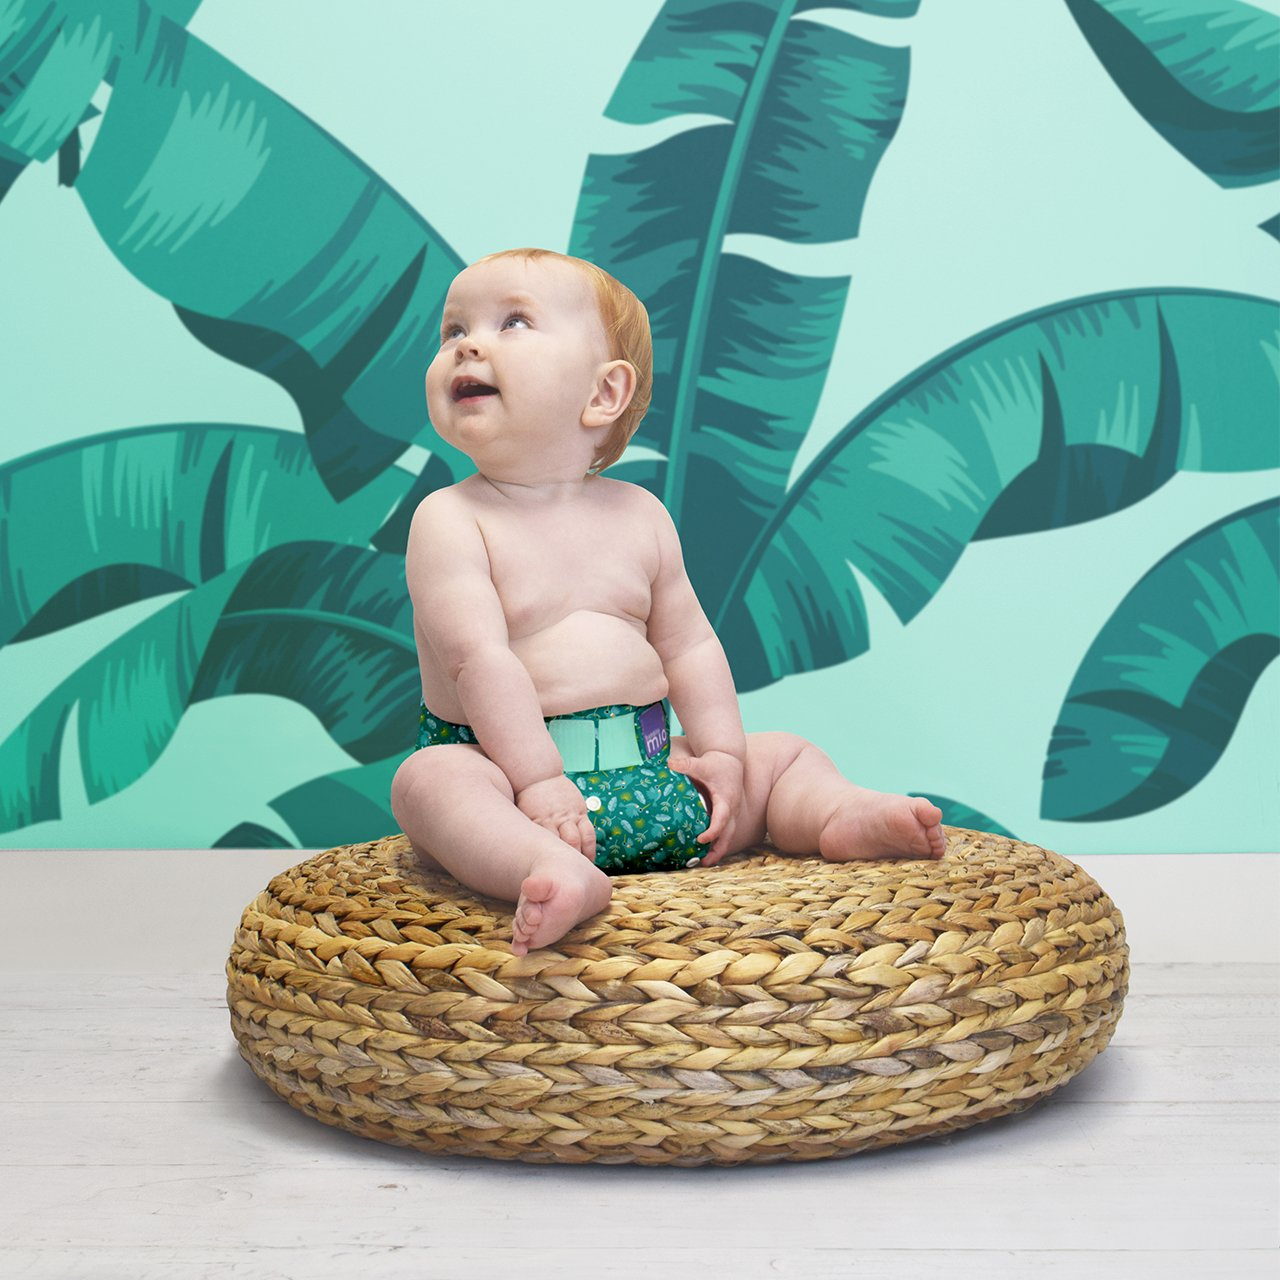 miosoft kit de la naissance /à la propret/é Bambino Mio blanc